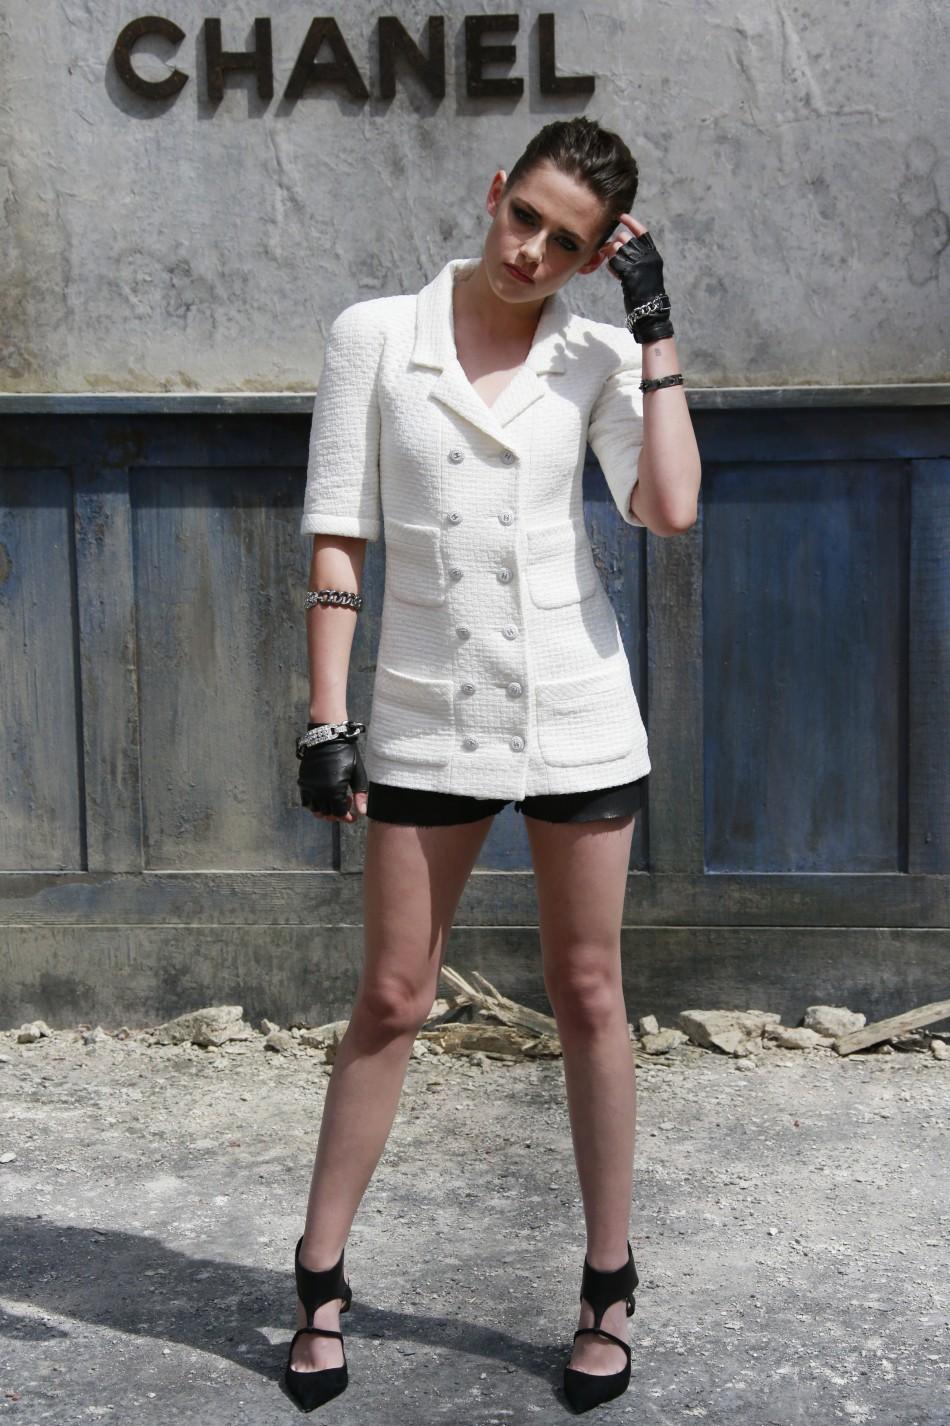 Paris fashion week 2013 kristen stewart rihanna stun at for American haute couture